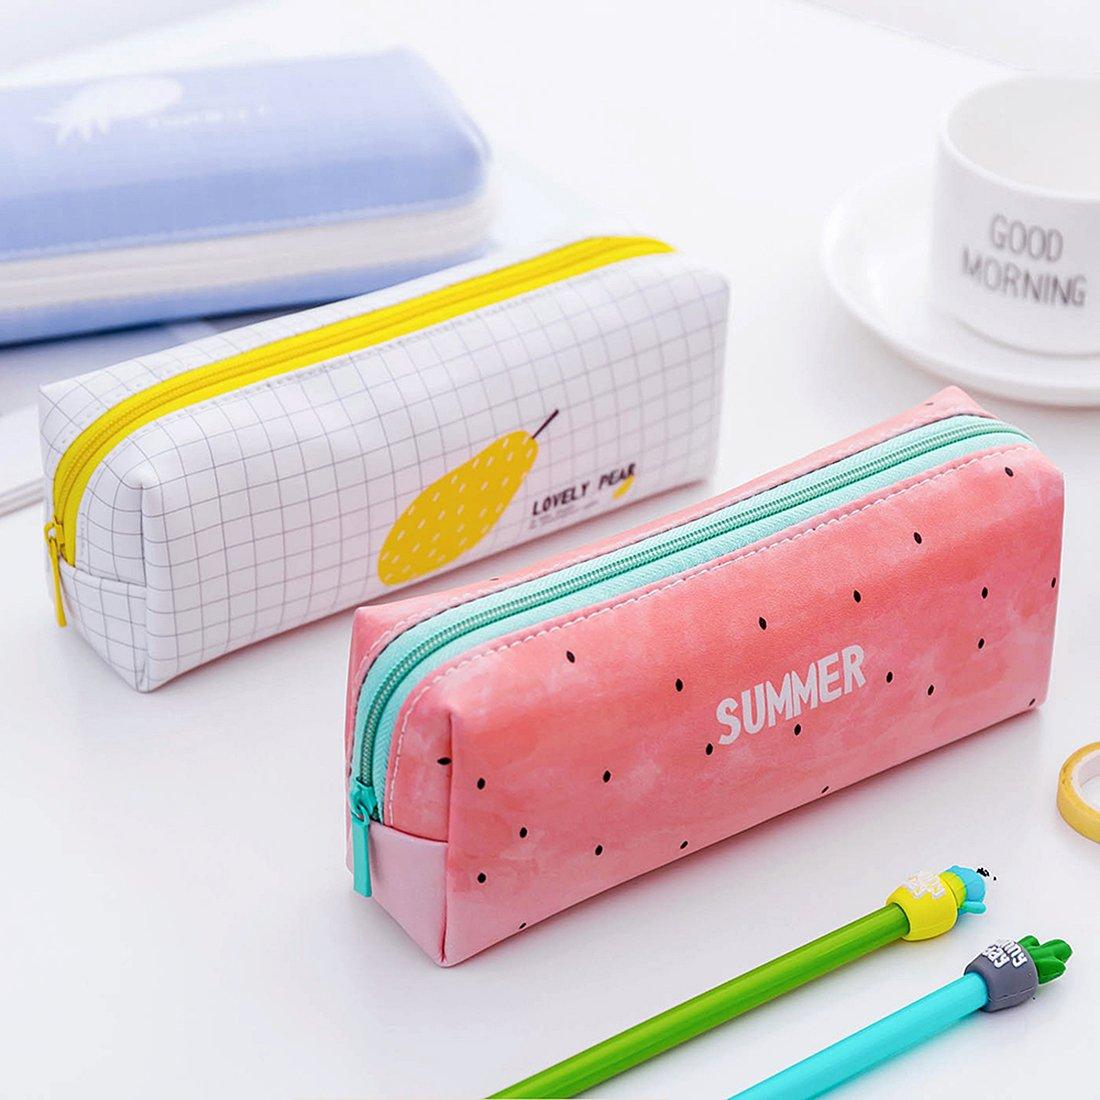 Amazon.com: iSuperb - Estuche para lápices, 2 unidades ...